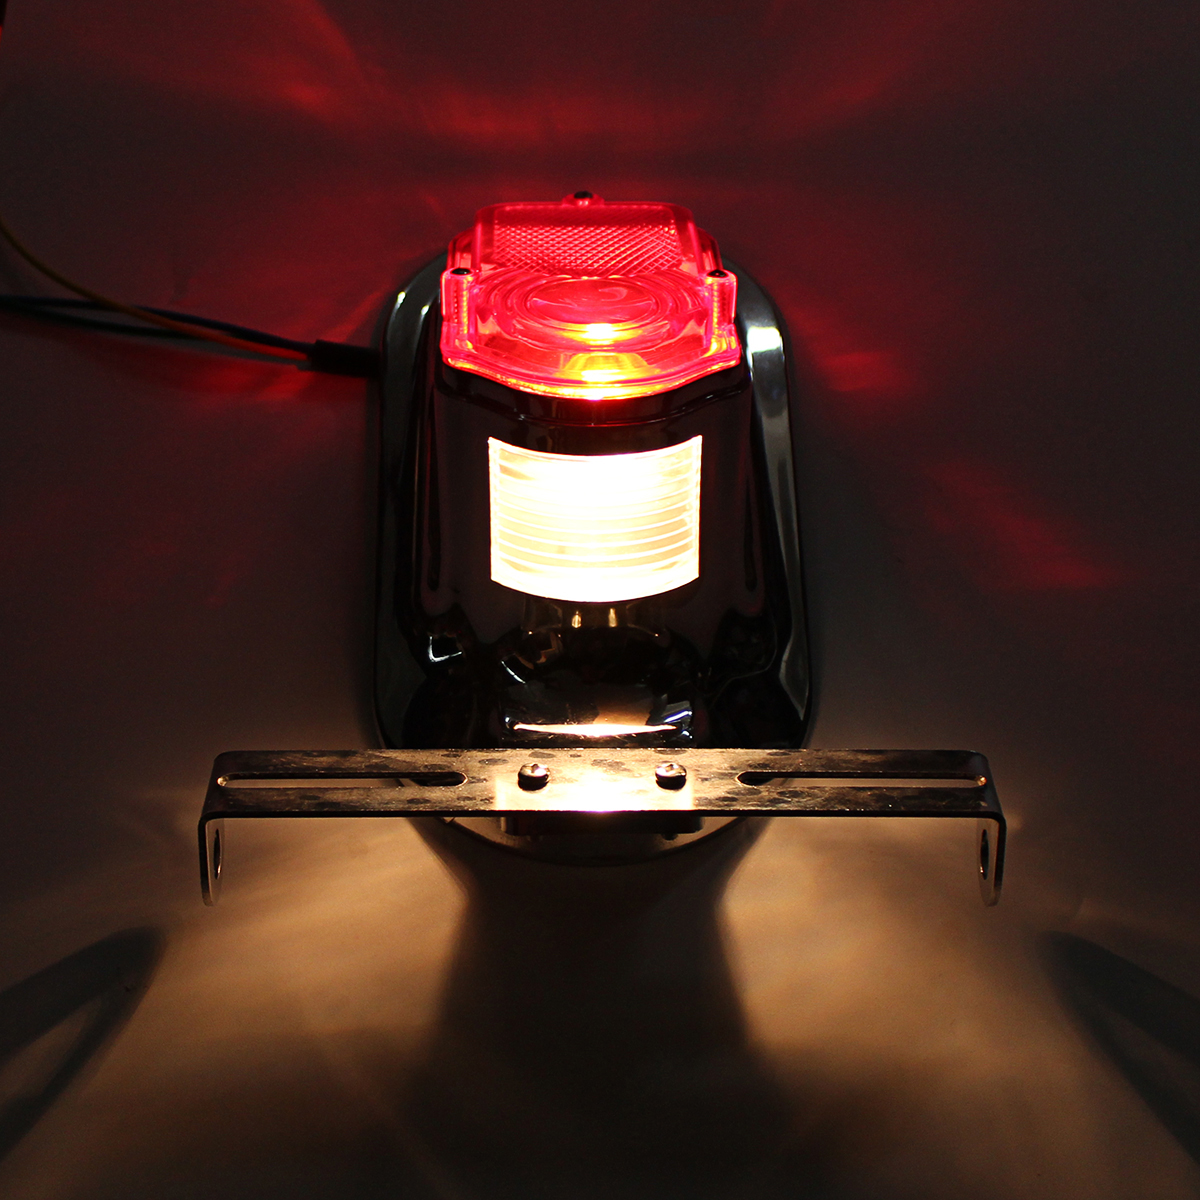 Motorcycle Rear Tail Lights Brake Stop Light Lamp License Plate Bracket For Harley Chopper Cafe Racer